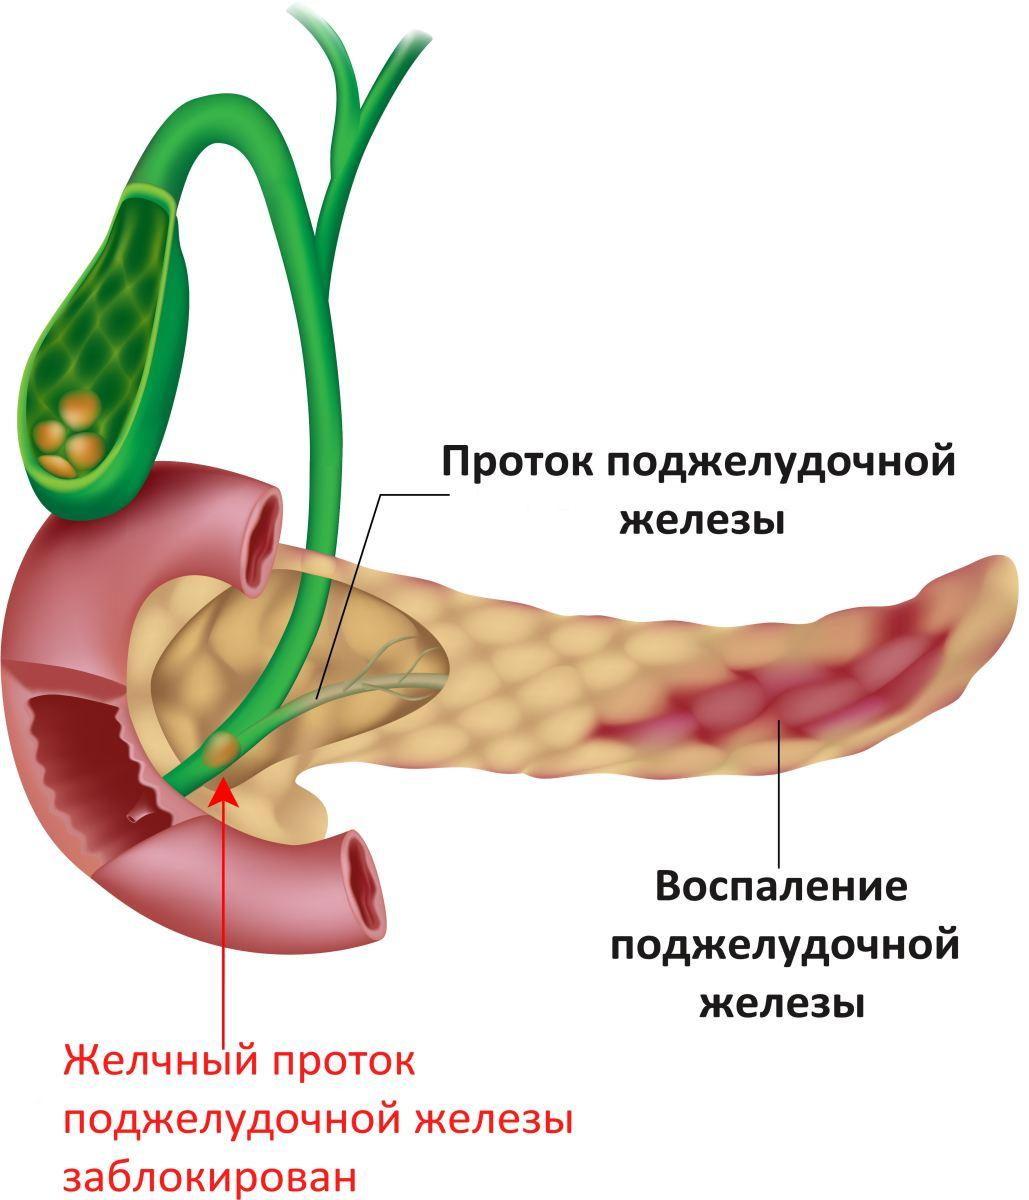 Диета при кистах поджелудочной железы